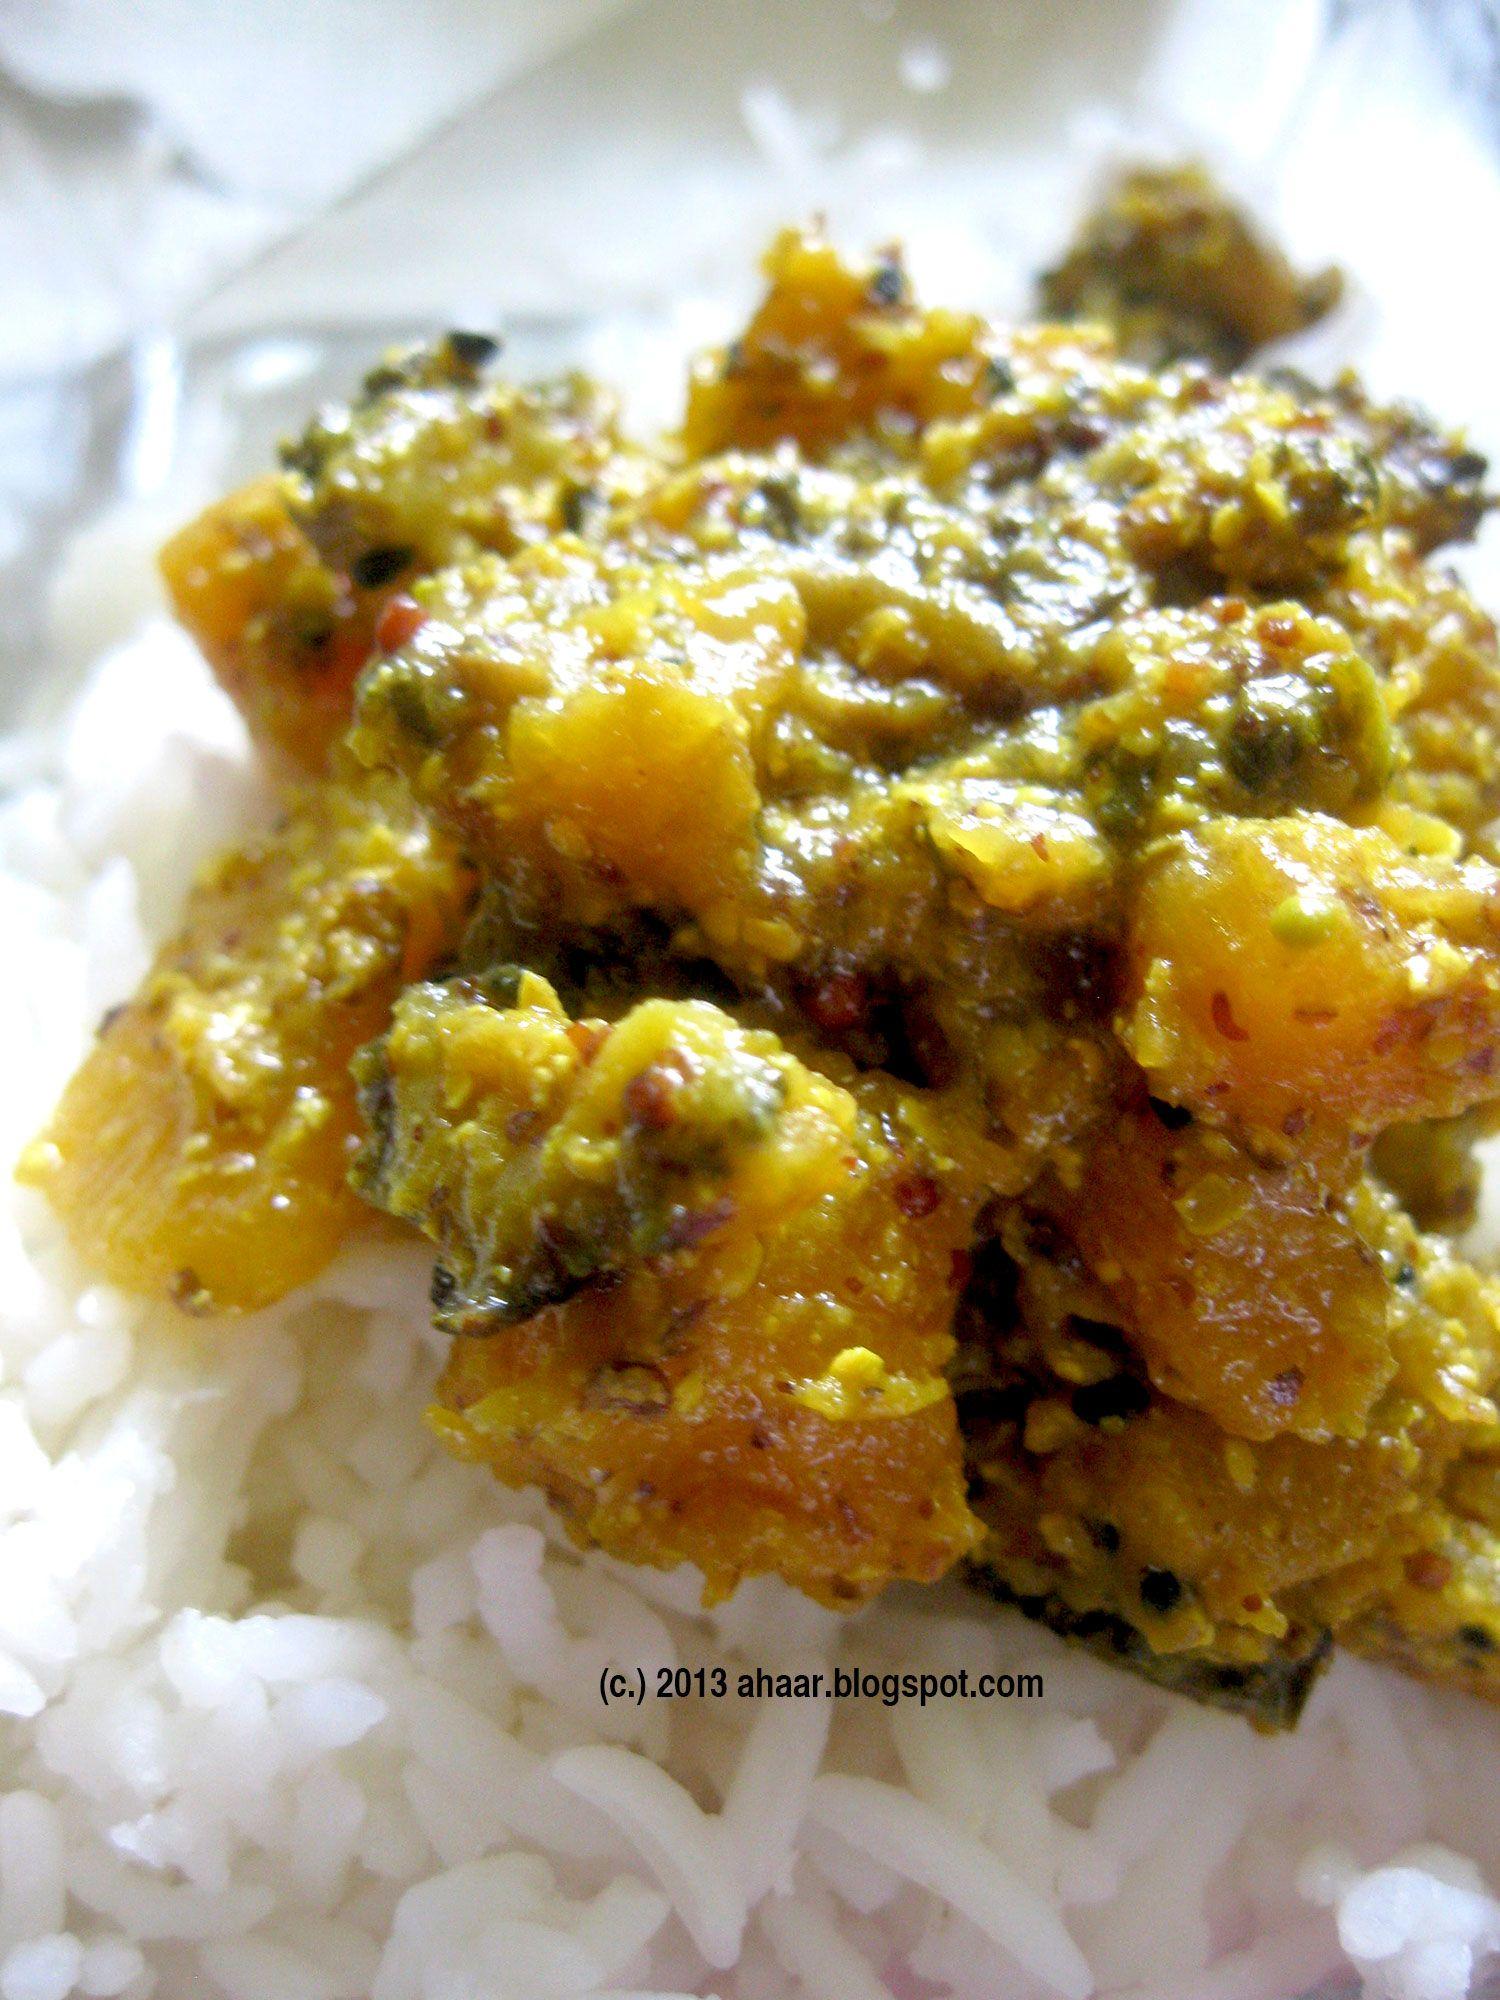 Kumro aar karela chorchori bengali recipe with butternut squash and kumro aar karela chorchori bengali recipe with butternut squash and bittergourd in a mustard paste forumfinder Image collections